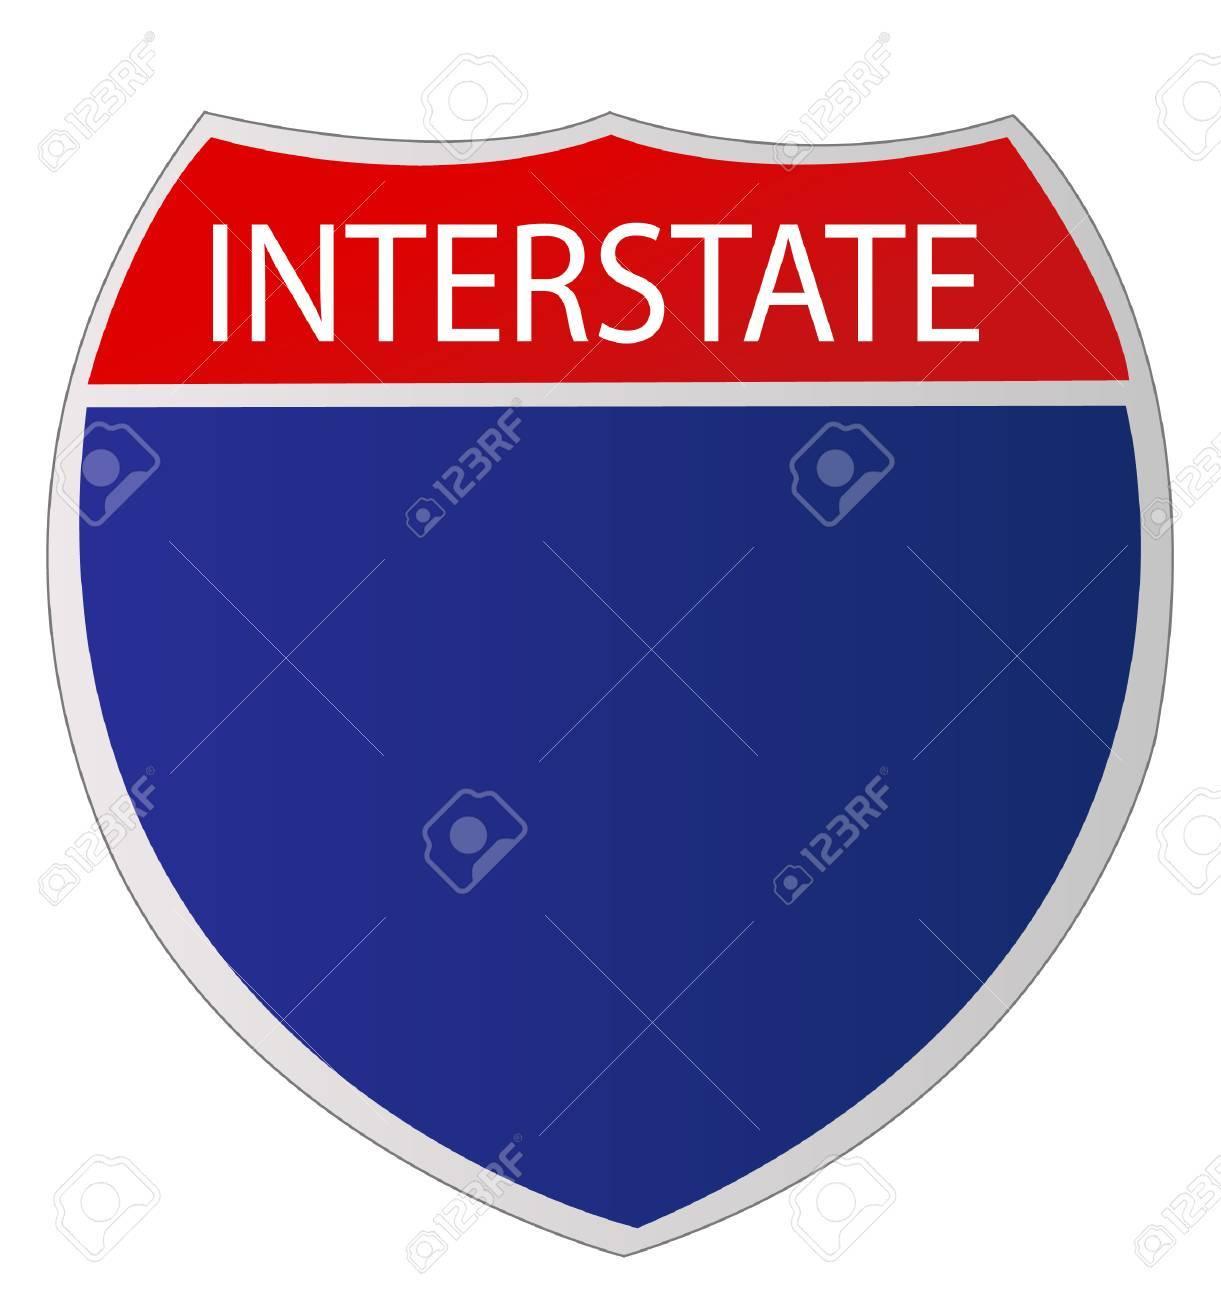 Interstate Sign - 26048891